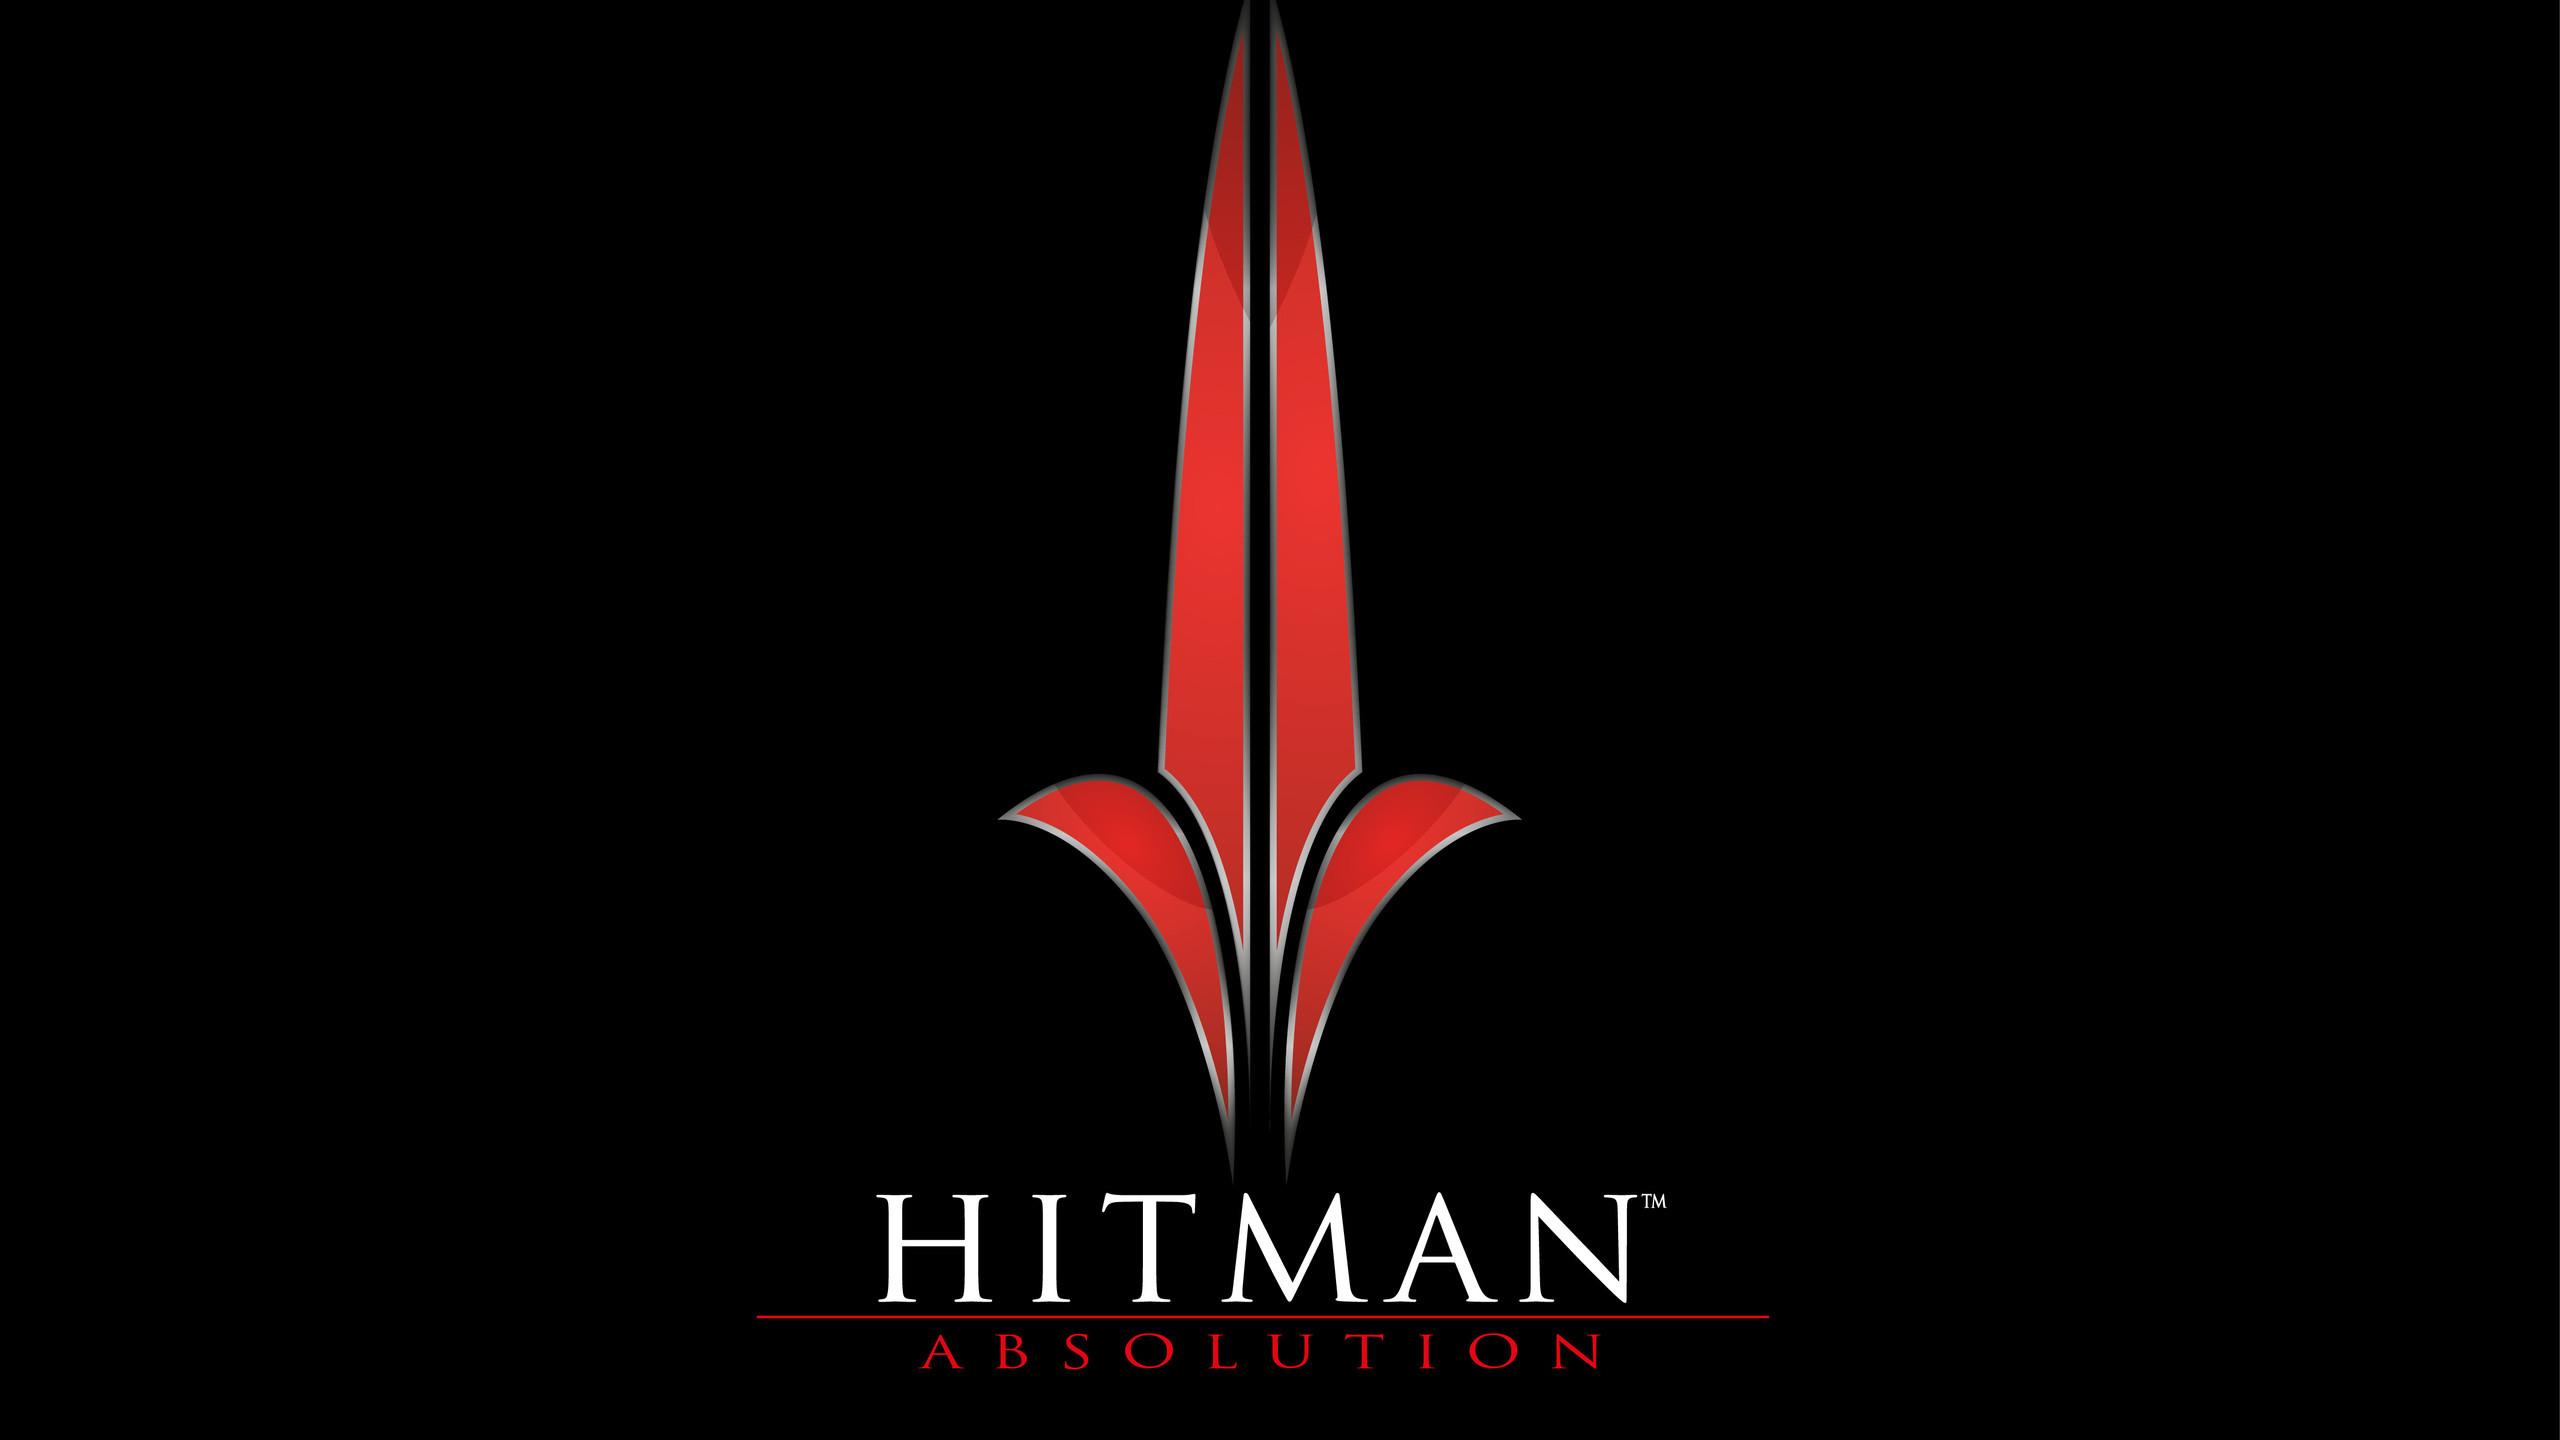 Hitman, Hitman Absolution, Hitman Absolution Game Logo